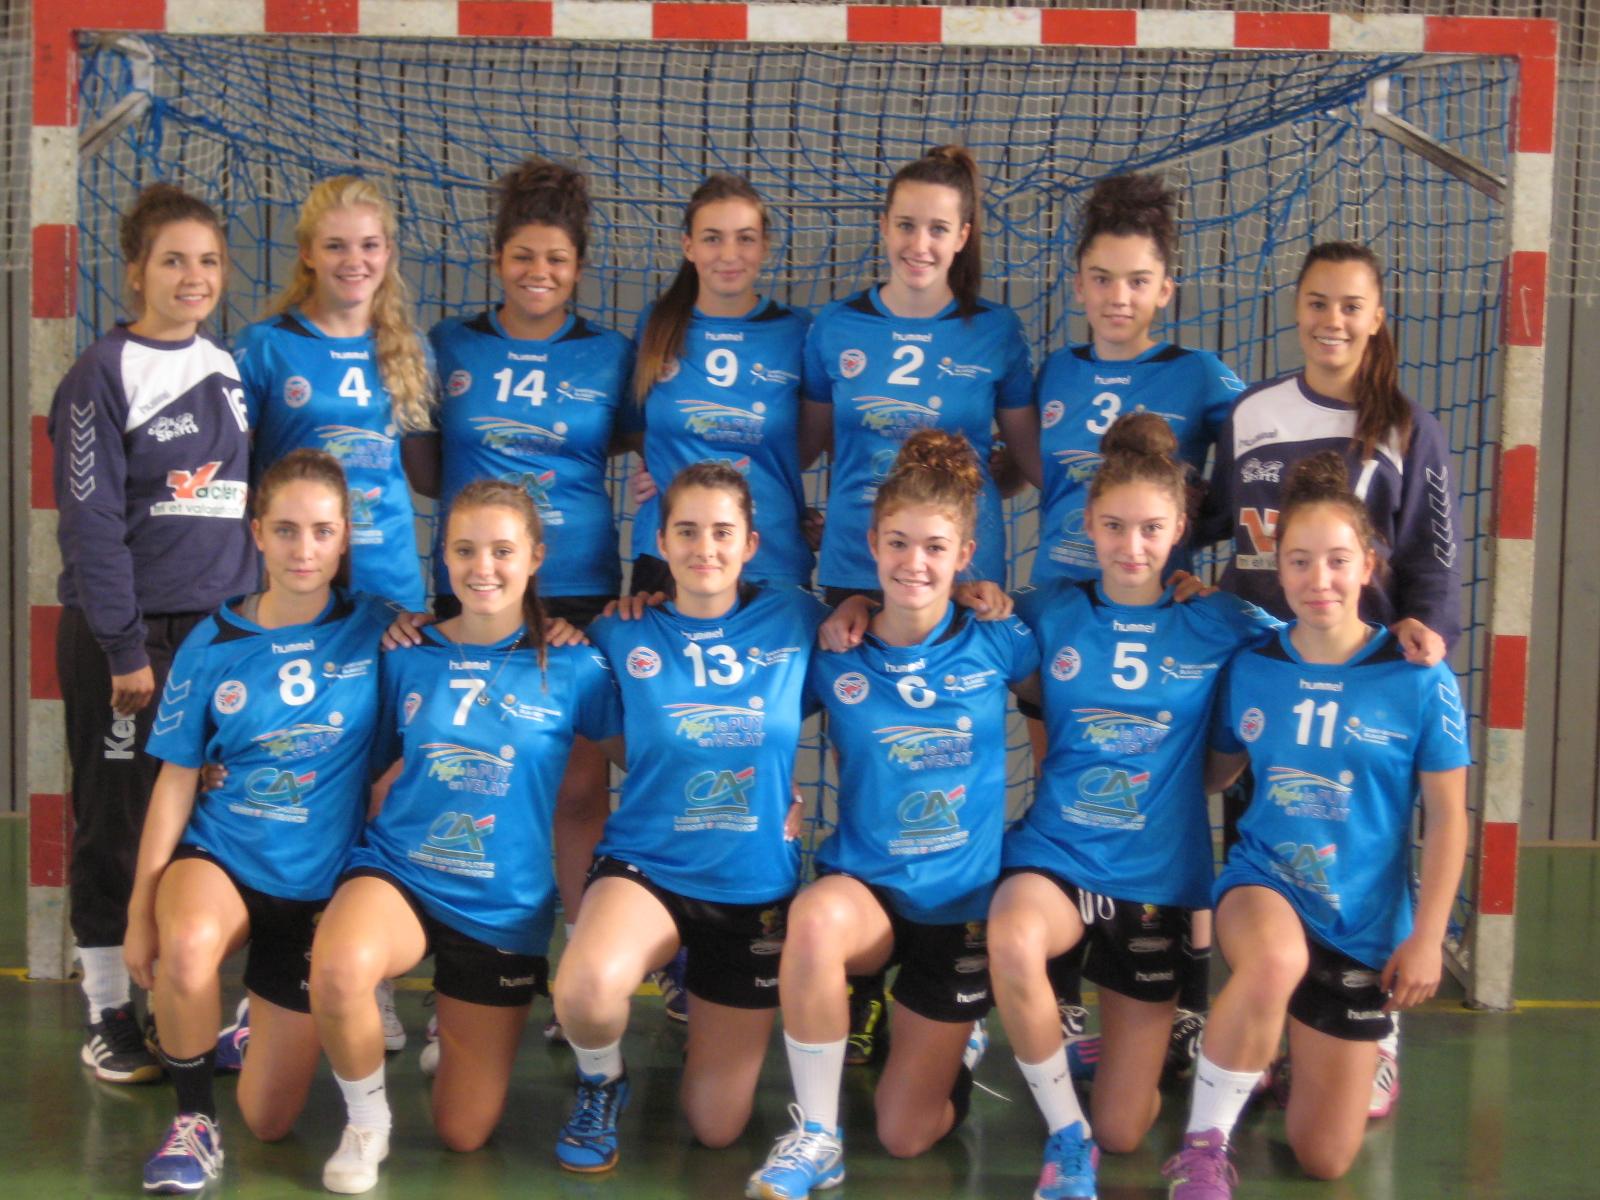 HAND BALL U18 NATIONALE FEMININE ST GERMAIN BLAVOZY HOPC – LE POUZIN 01/10/16  18H30